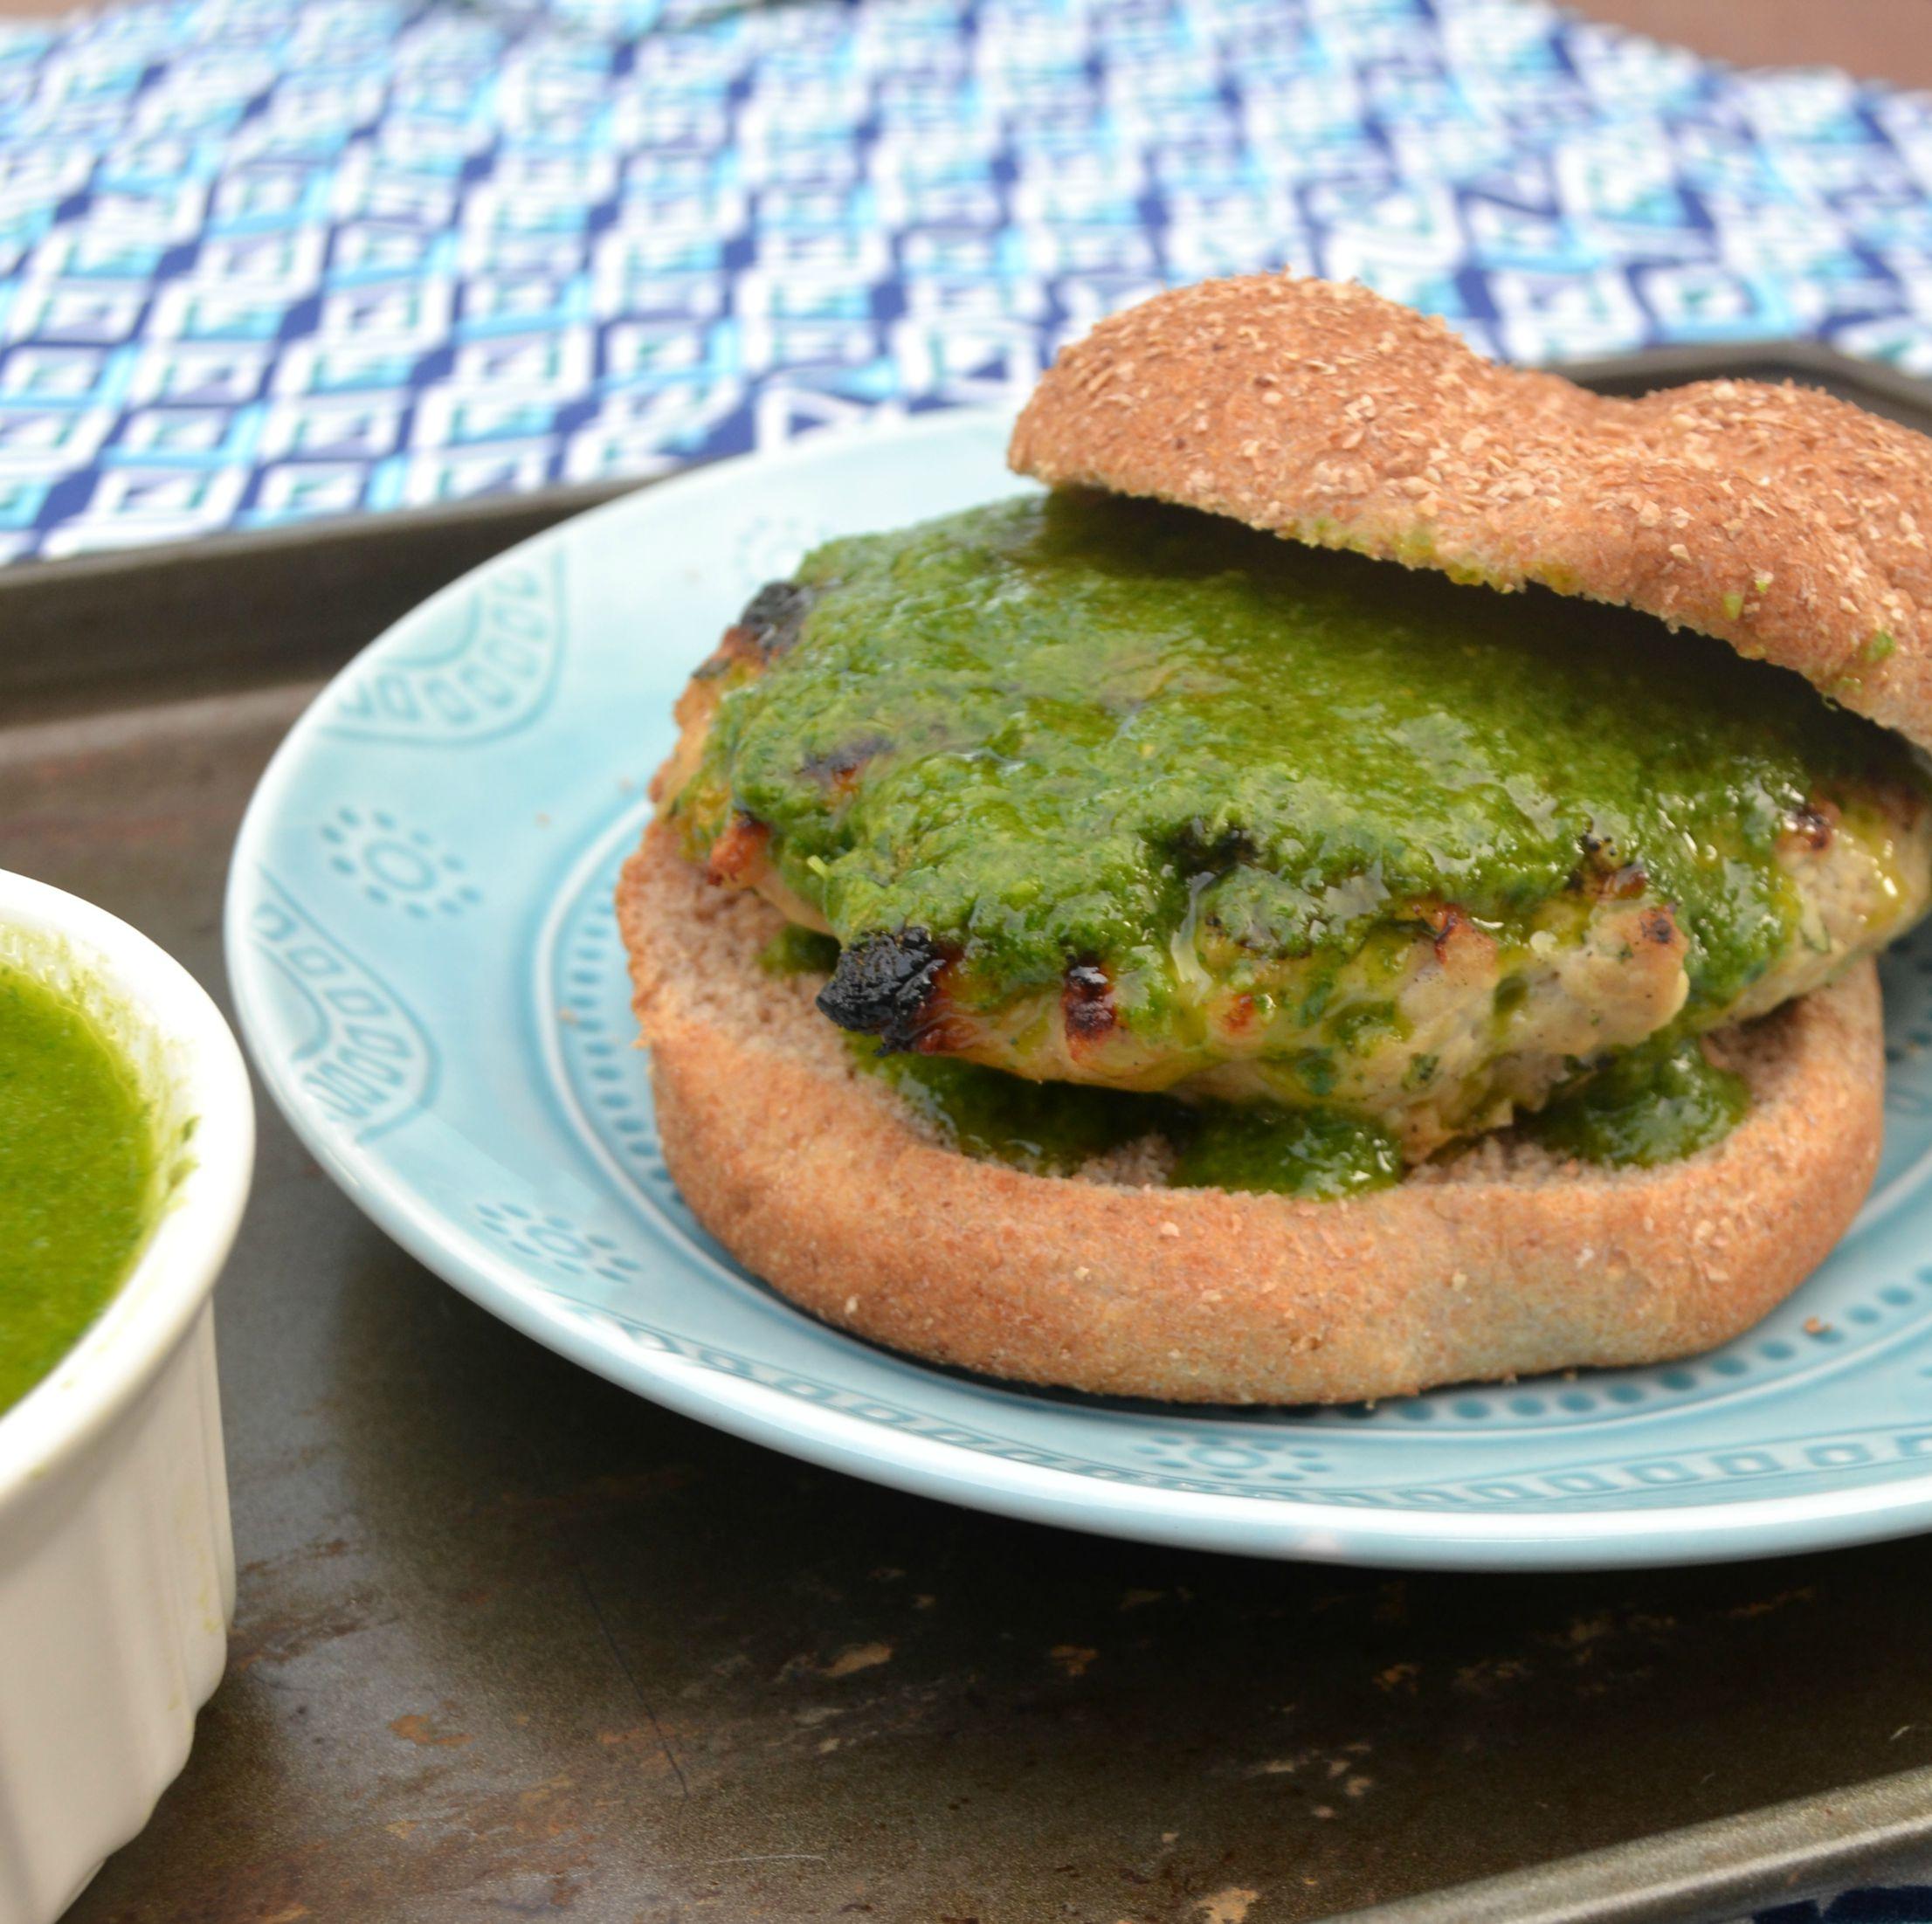 Turkey Burger with Chimichurri Sauce